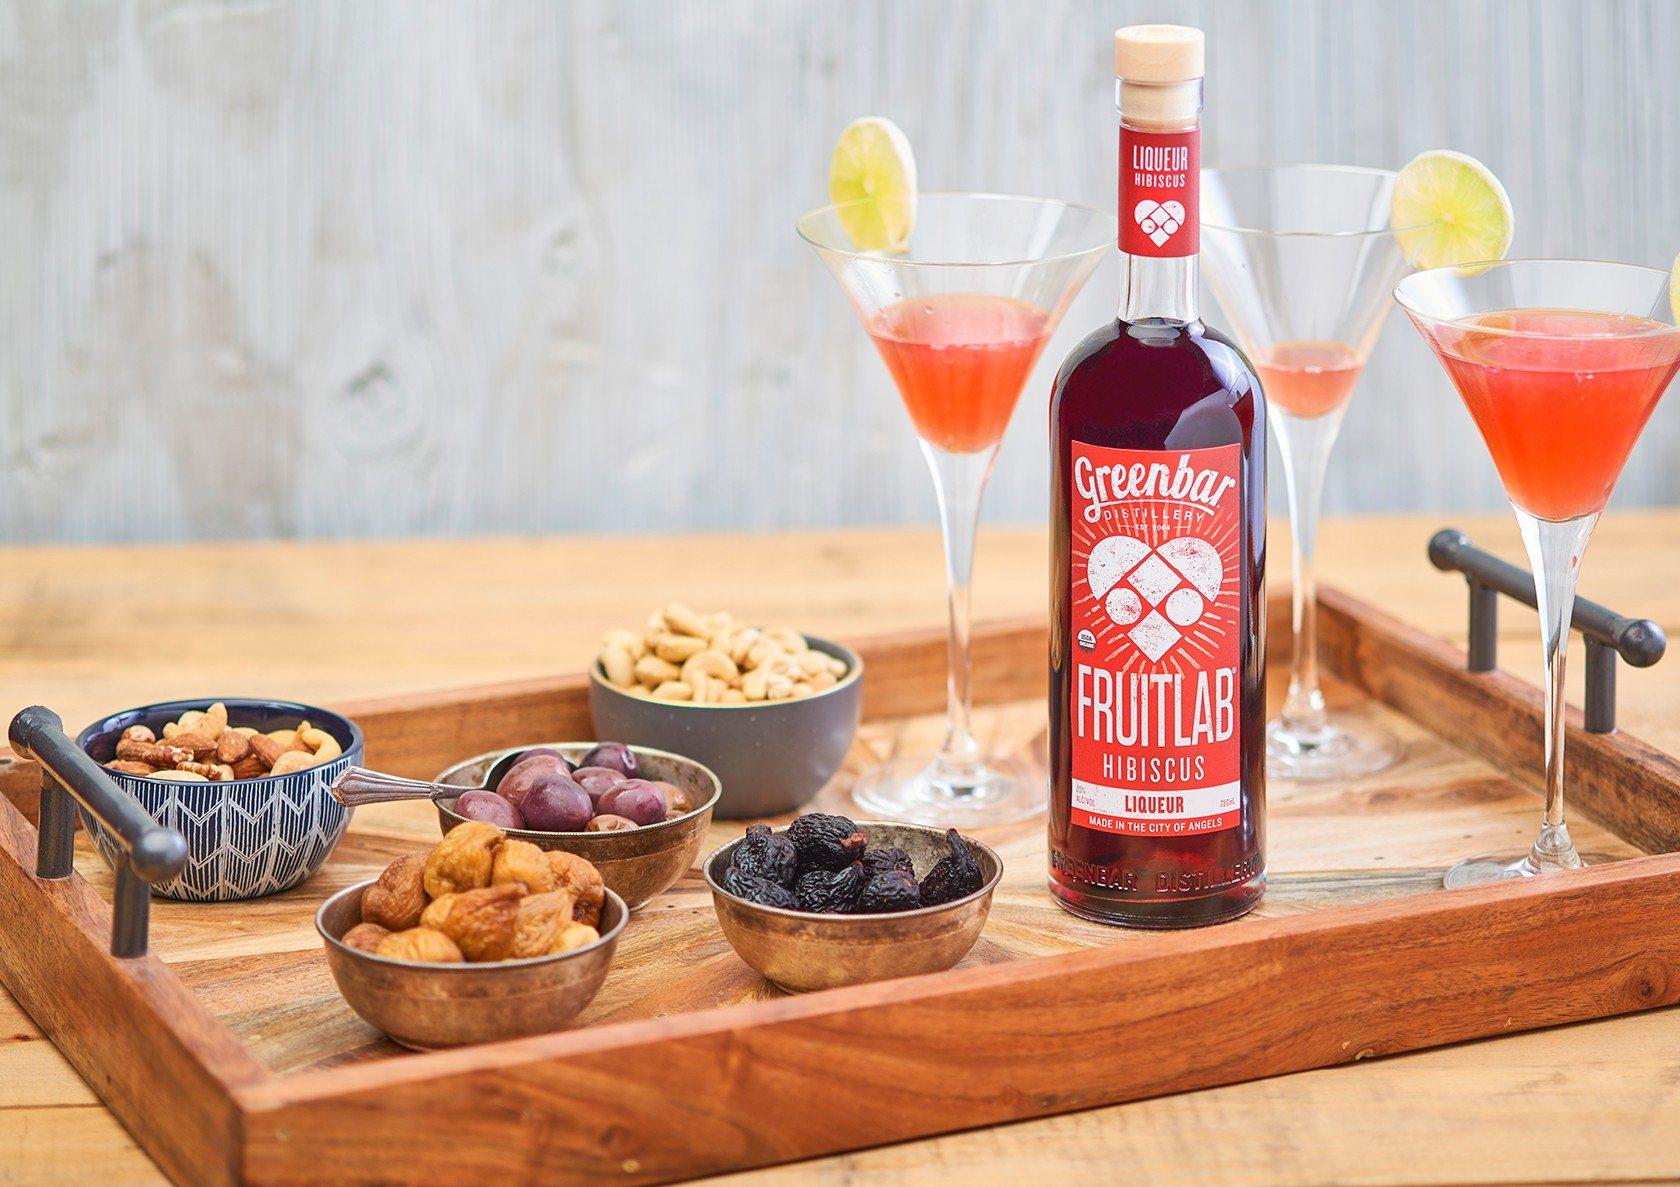 greenbar distillery fruitlab hibiscus